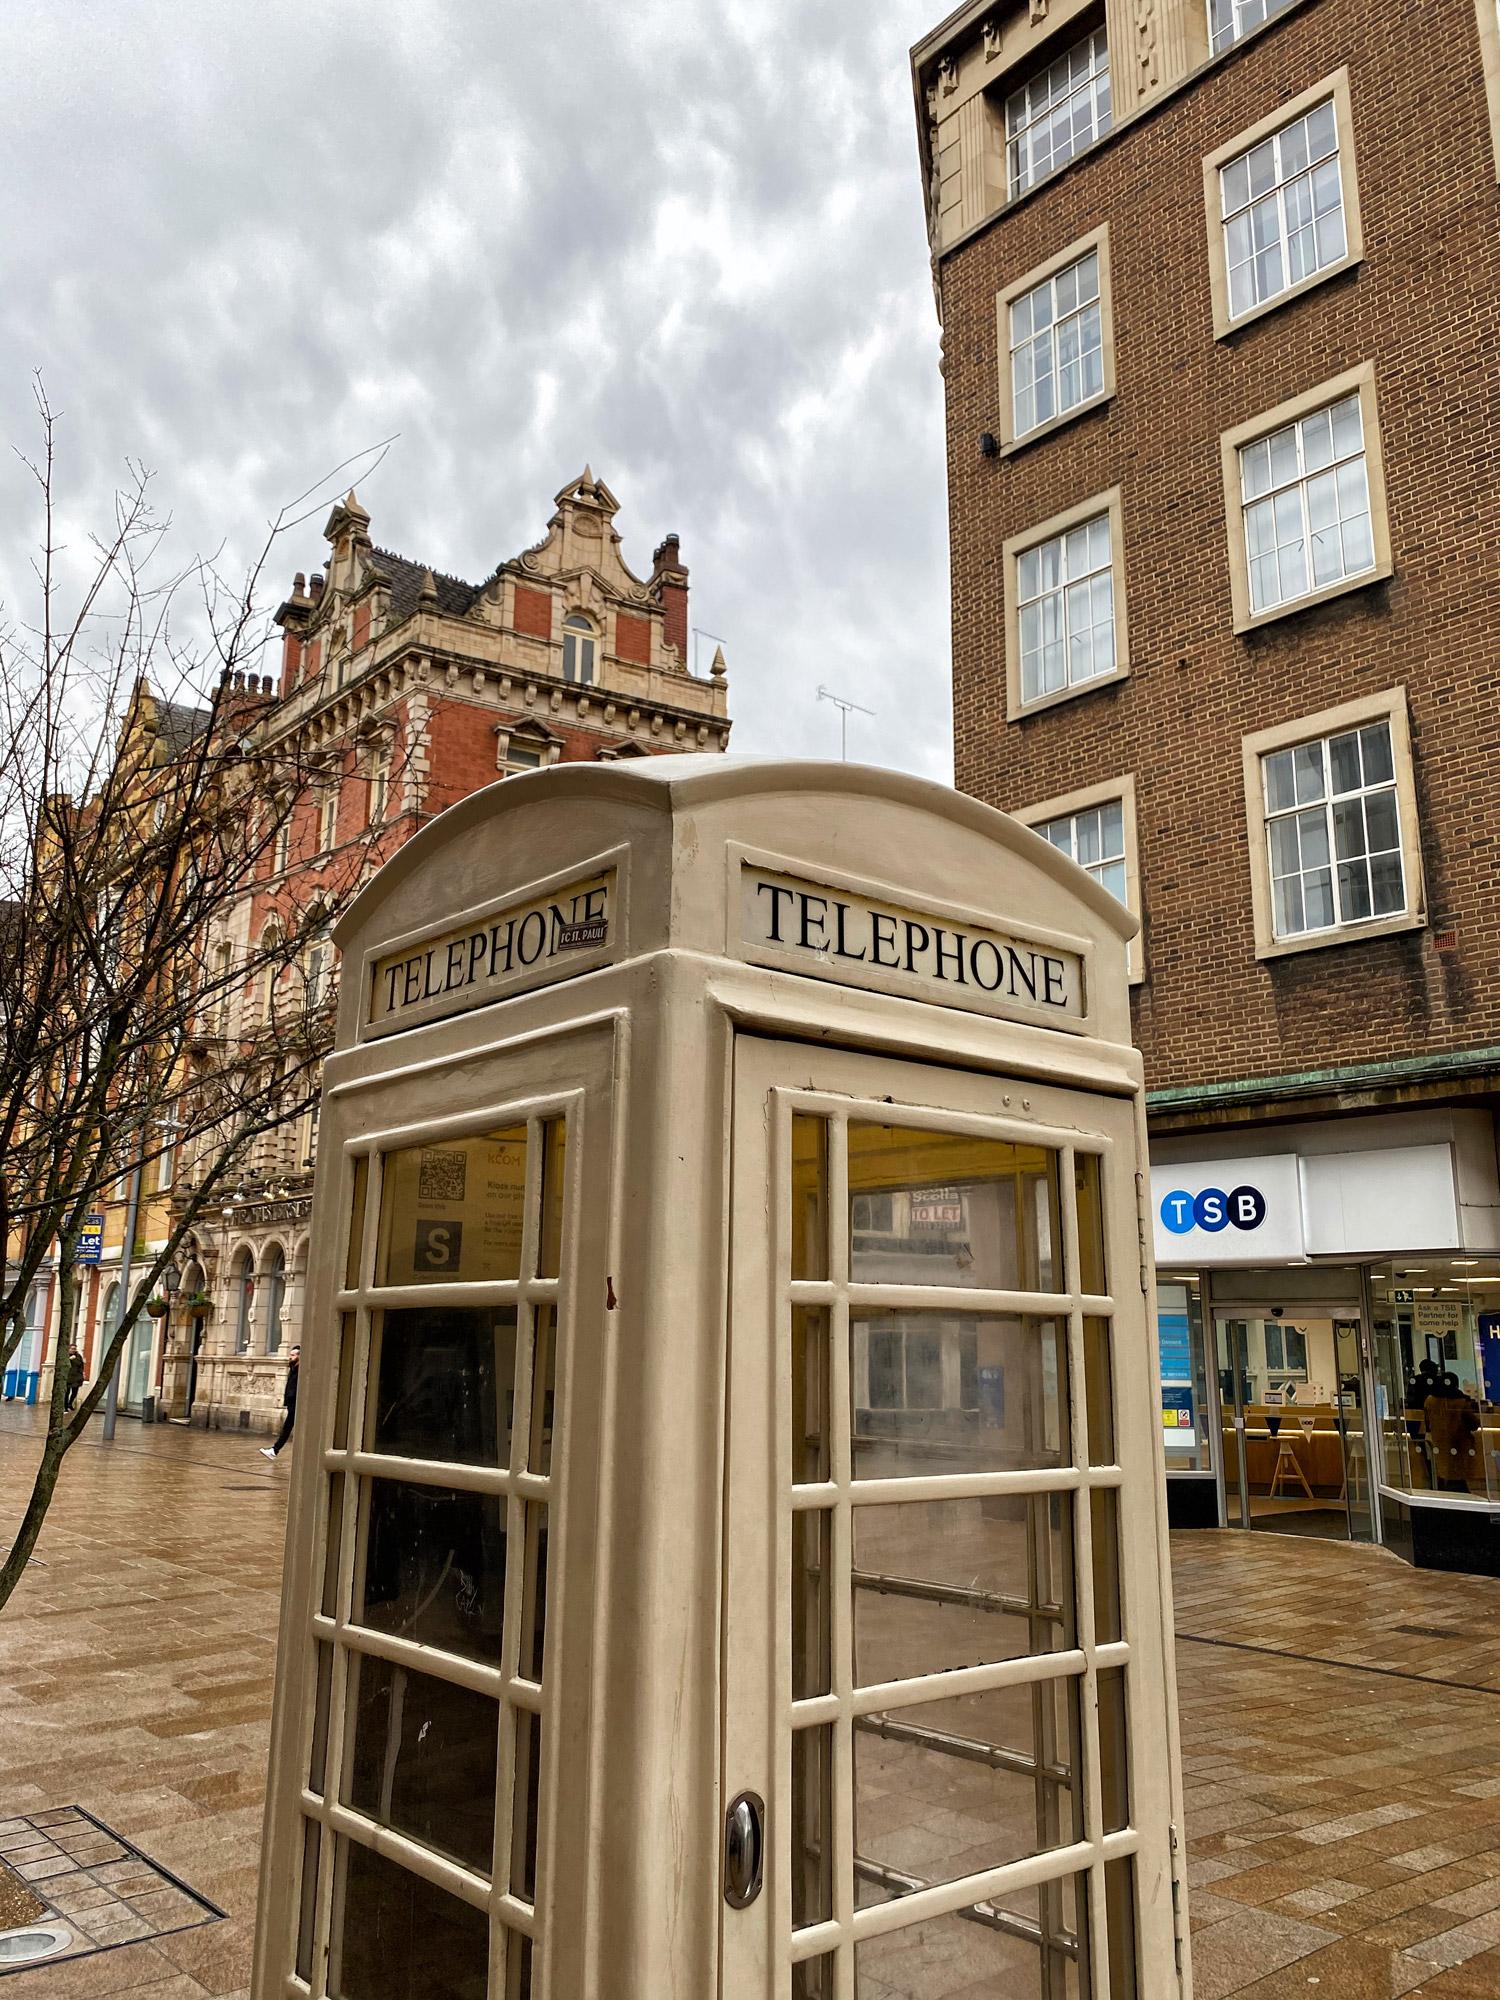 Stedentrip Hull - Telefooncel